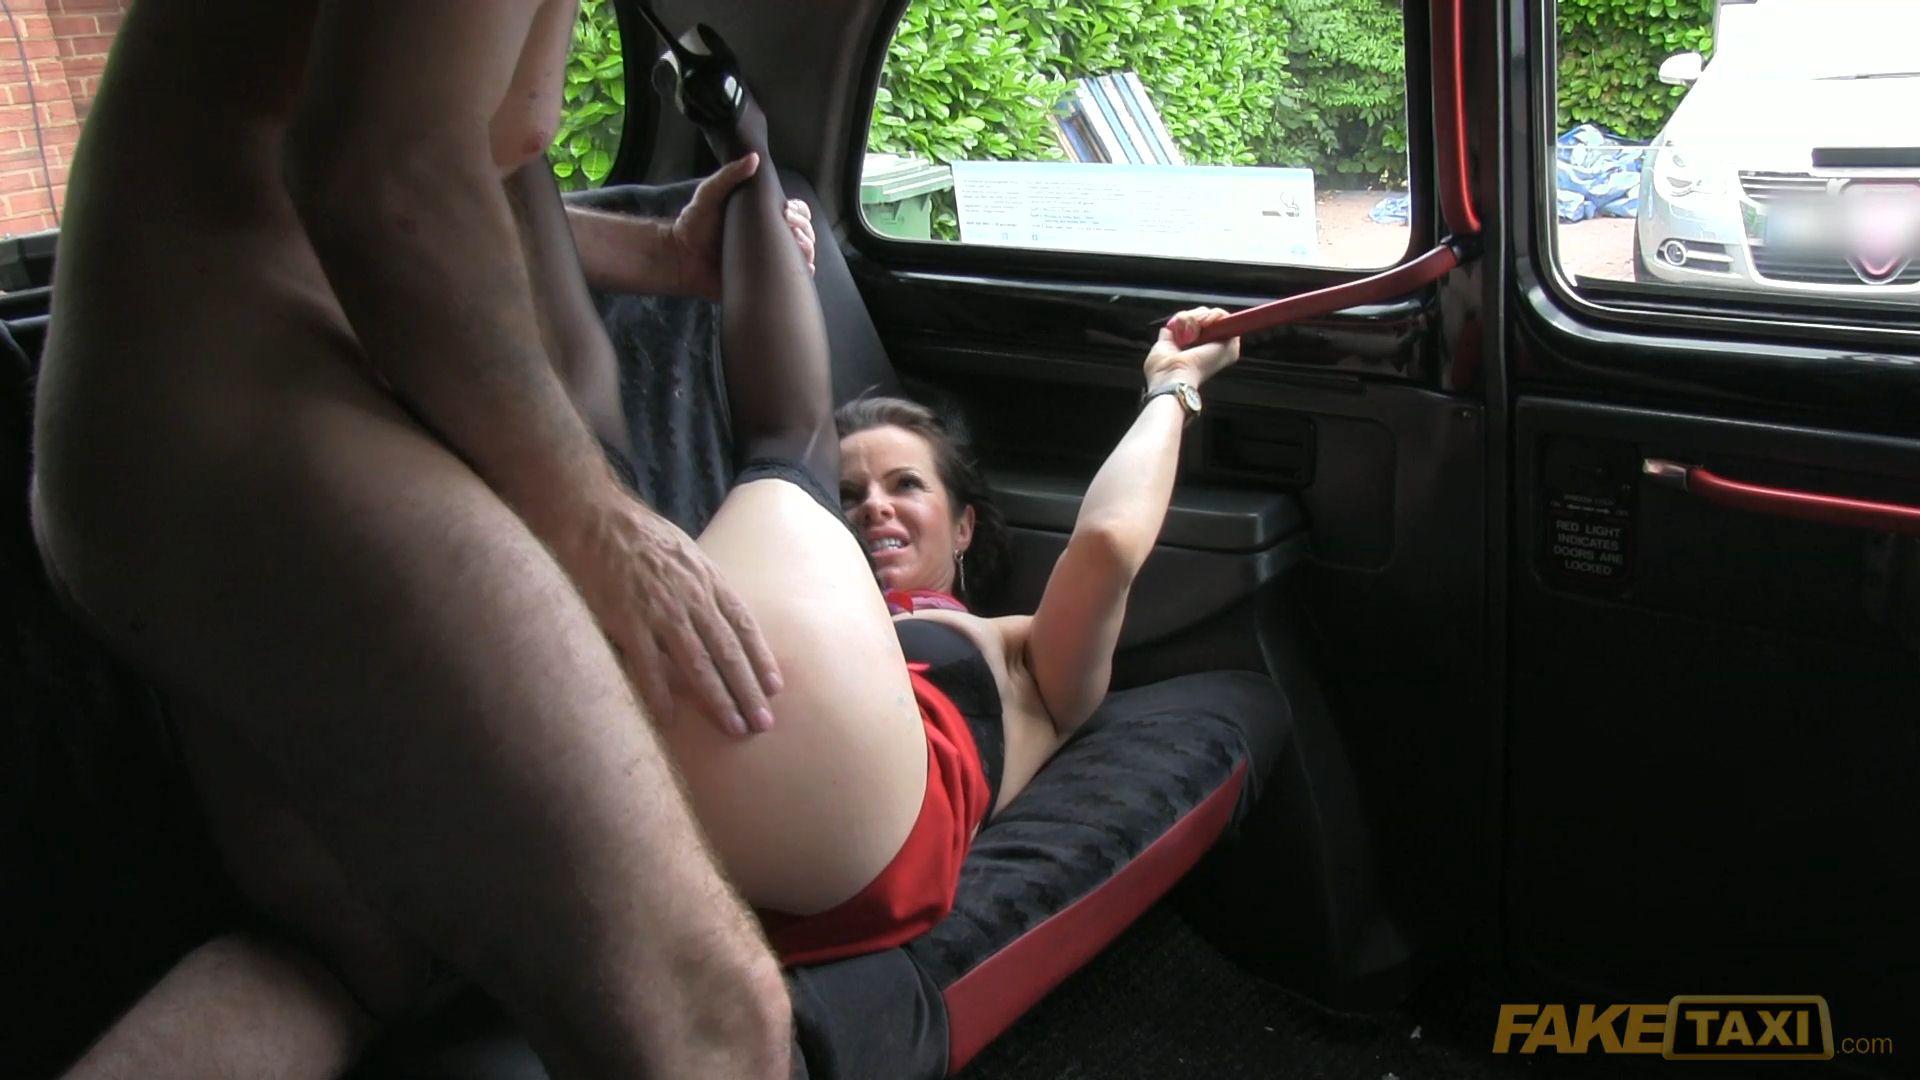 taxi-sex-video-sexy-irina-shayk-nude